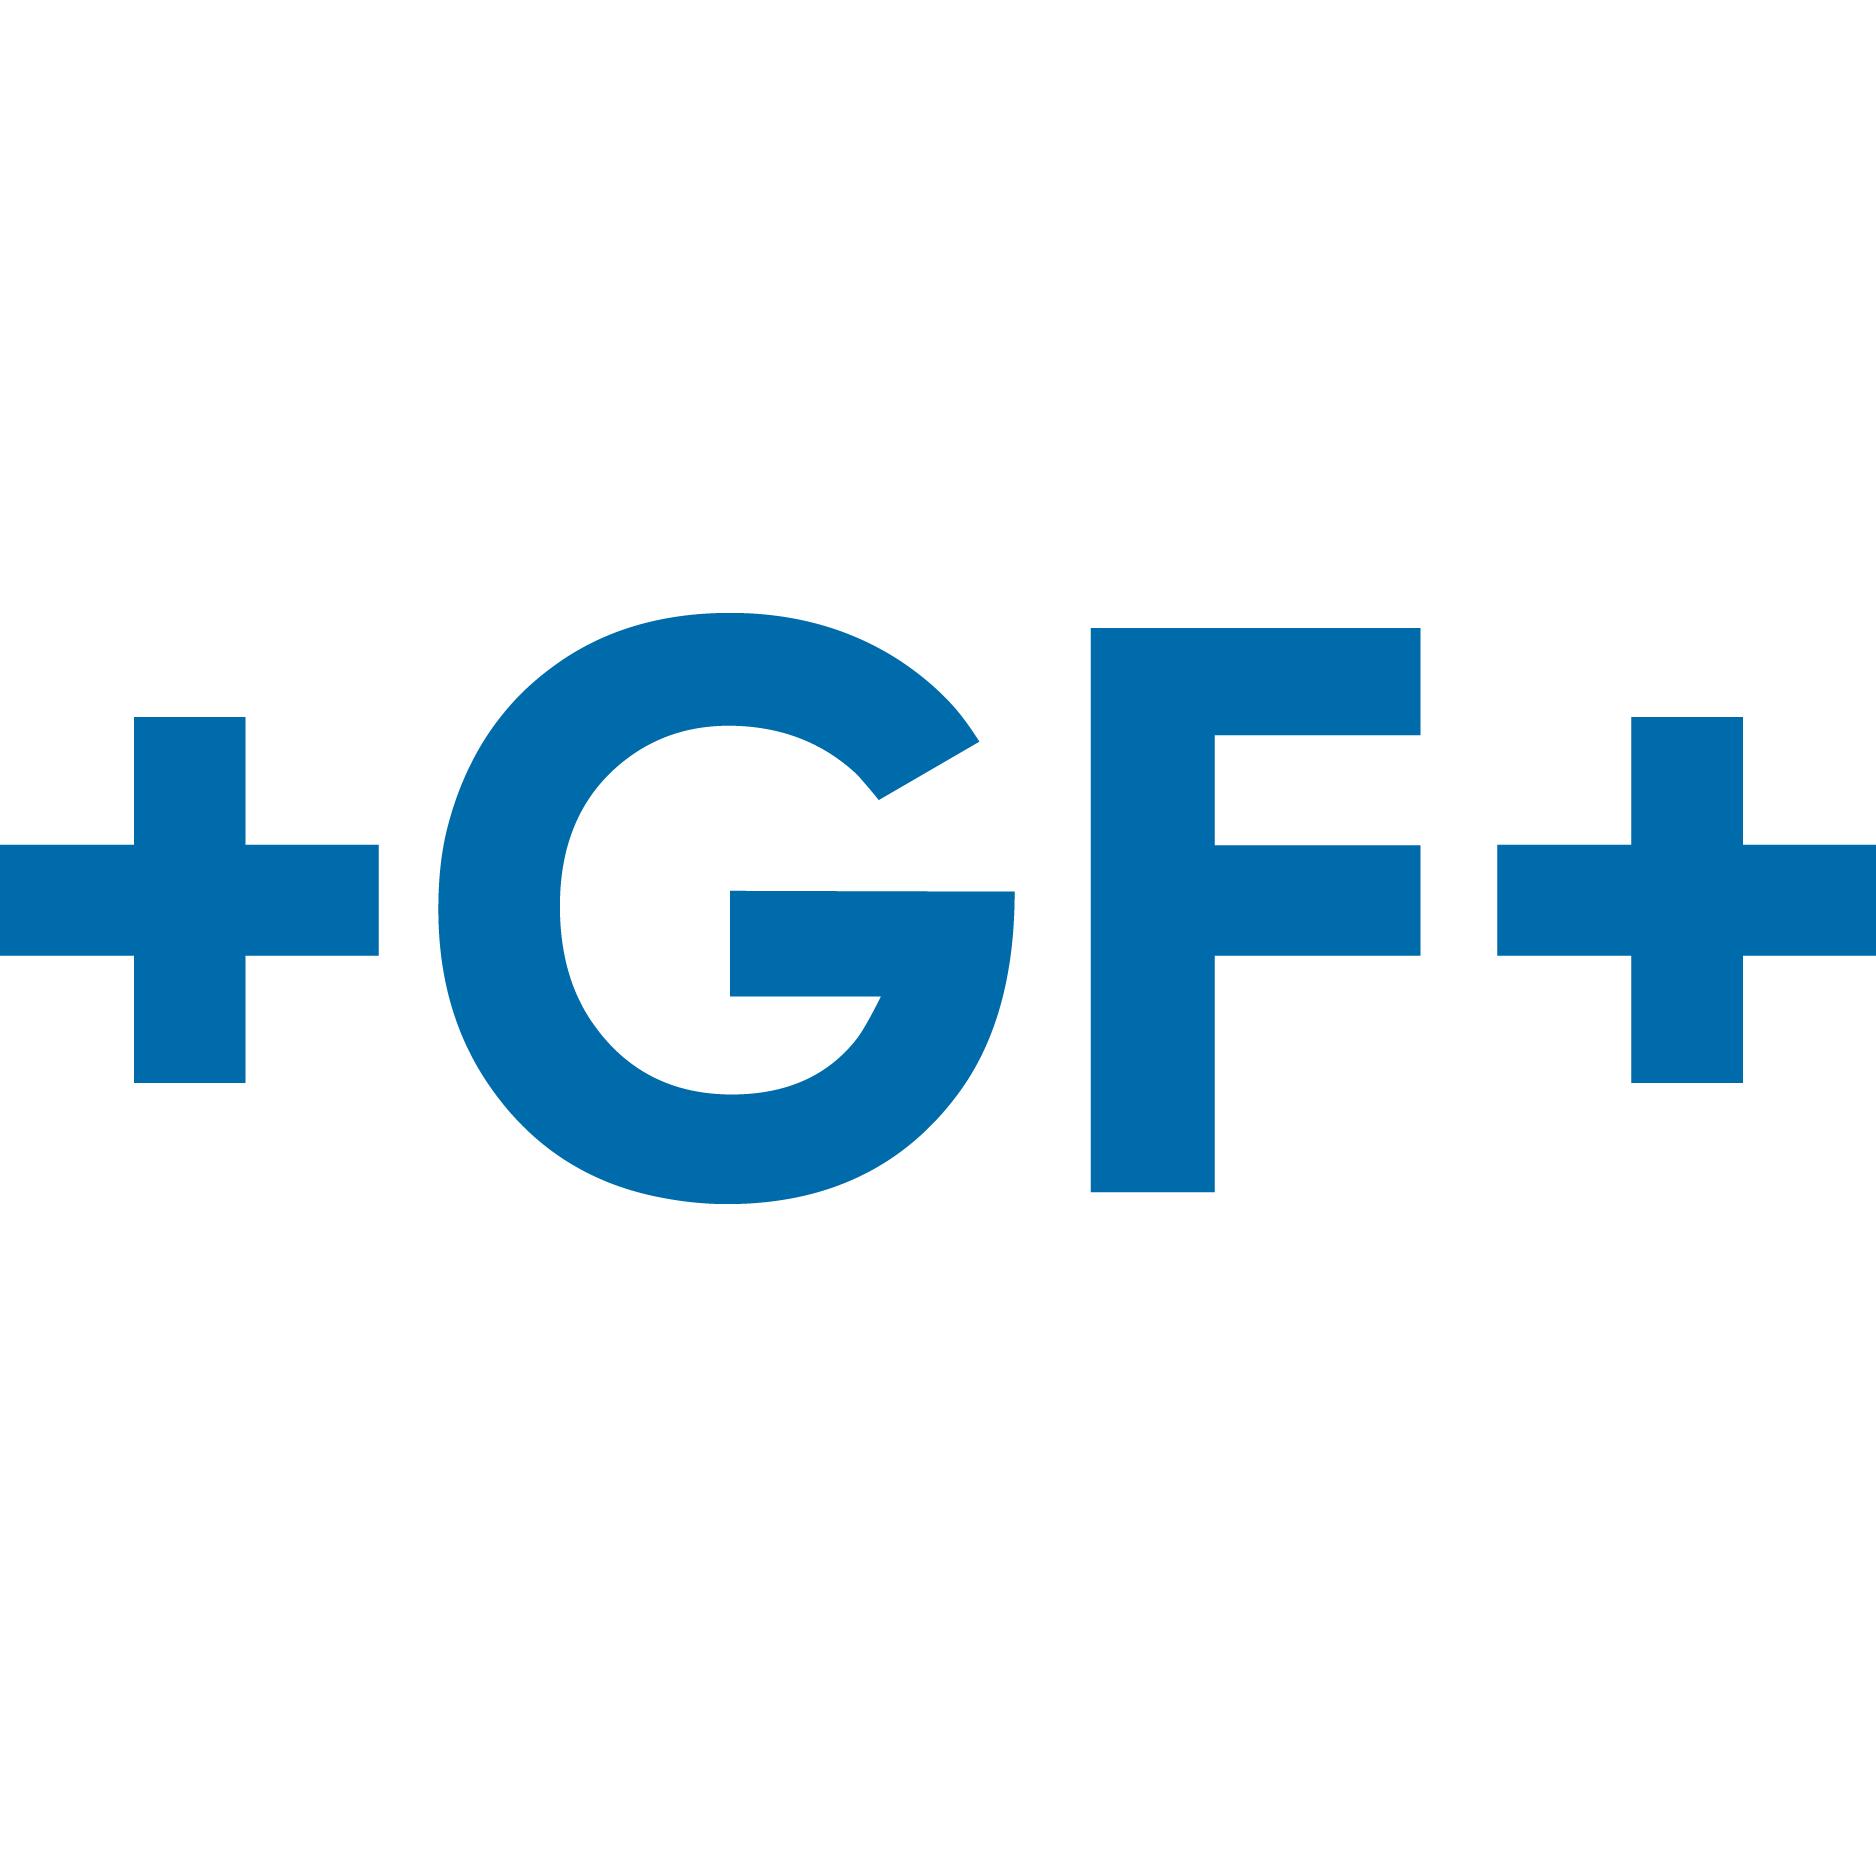 Georg Fischer Sistemas de Tubulações Ltda